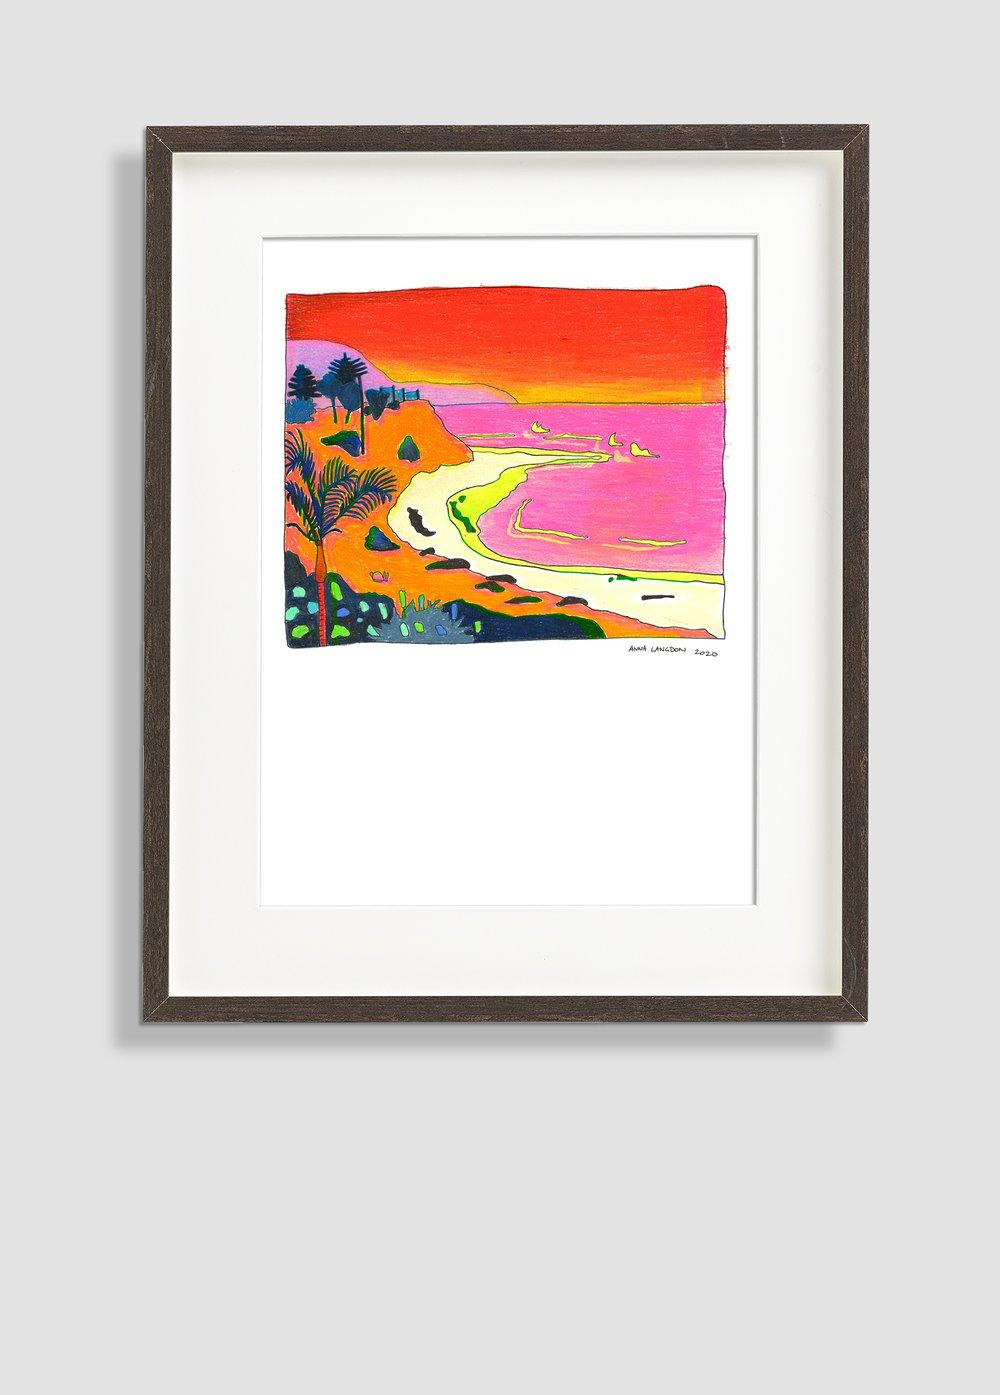 Coledale 2020 A3 Limited Edition (100) Giclée Print